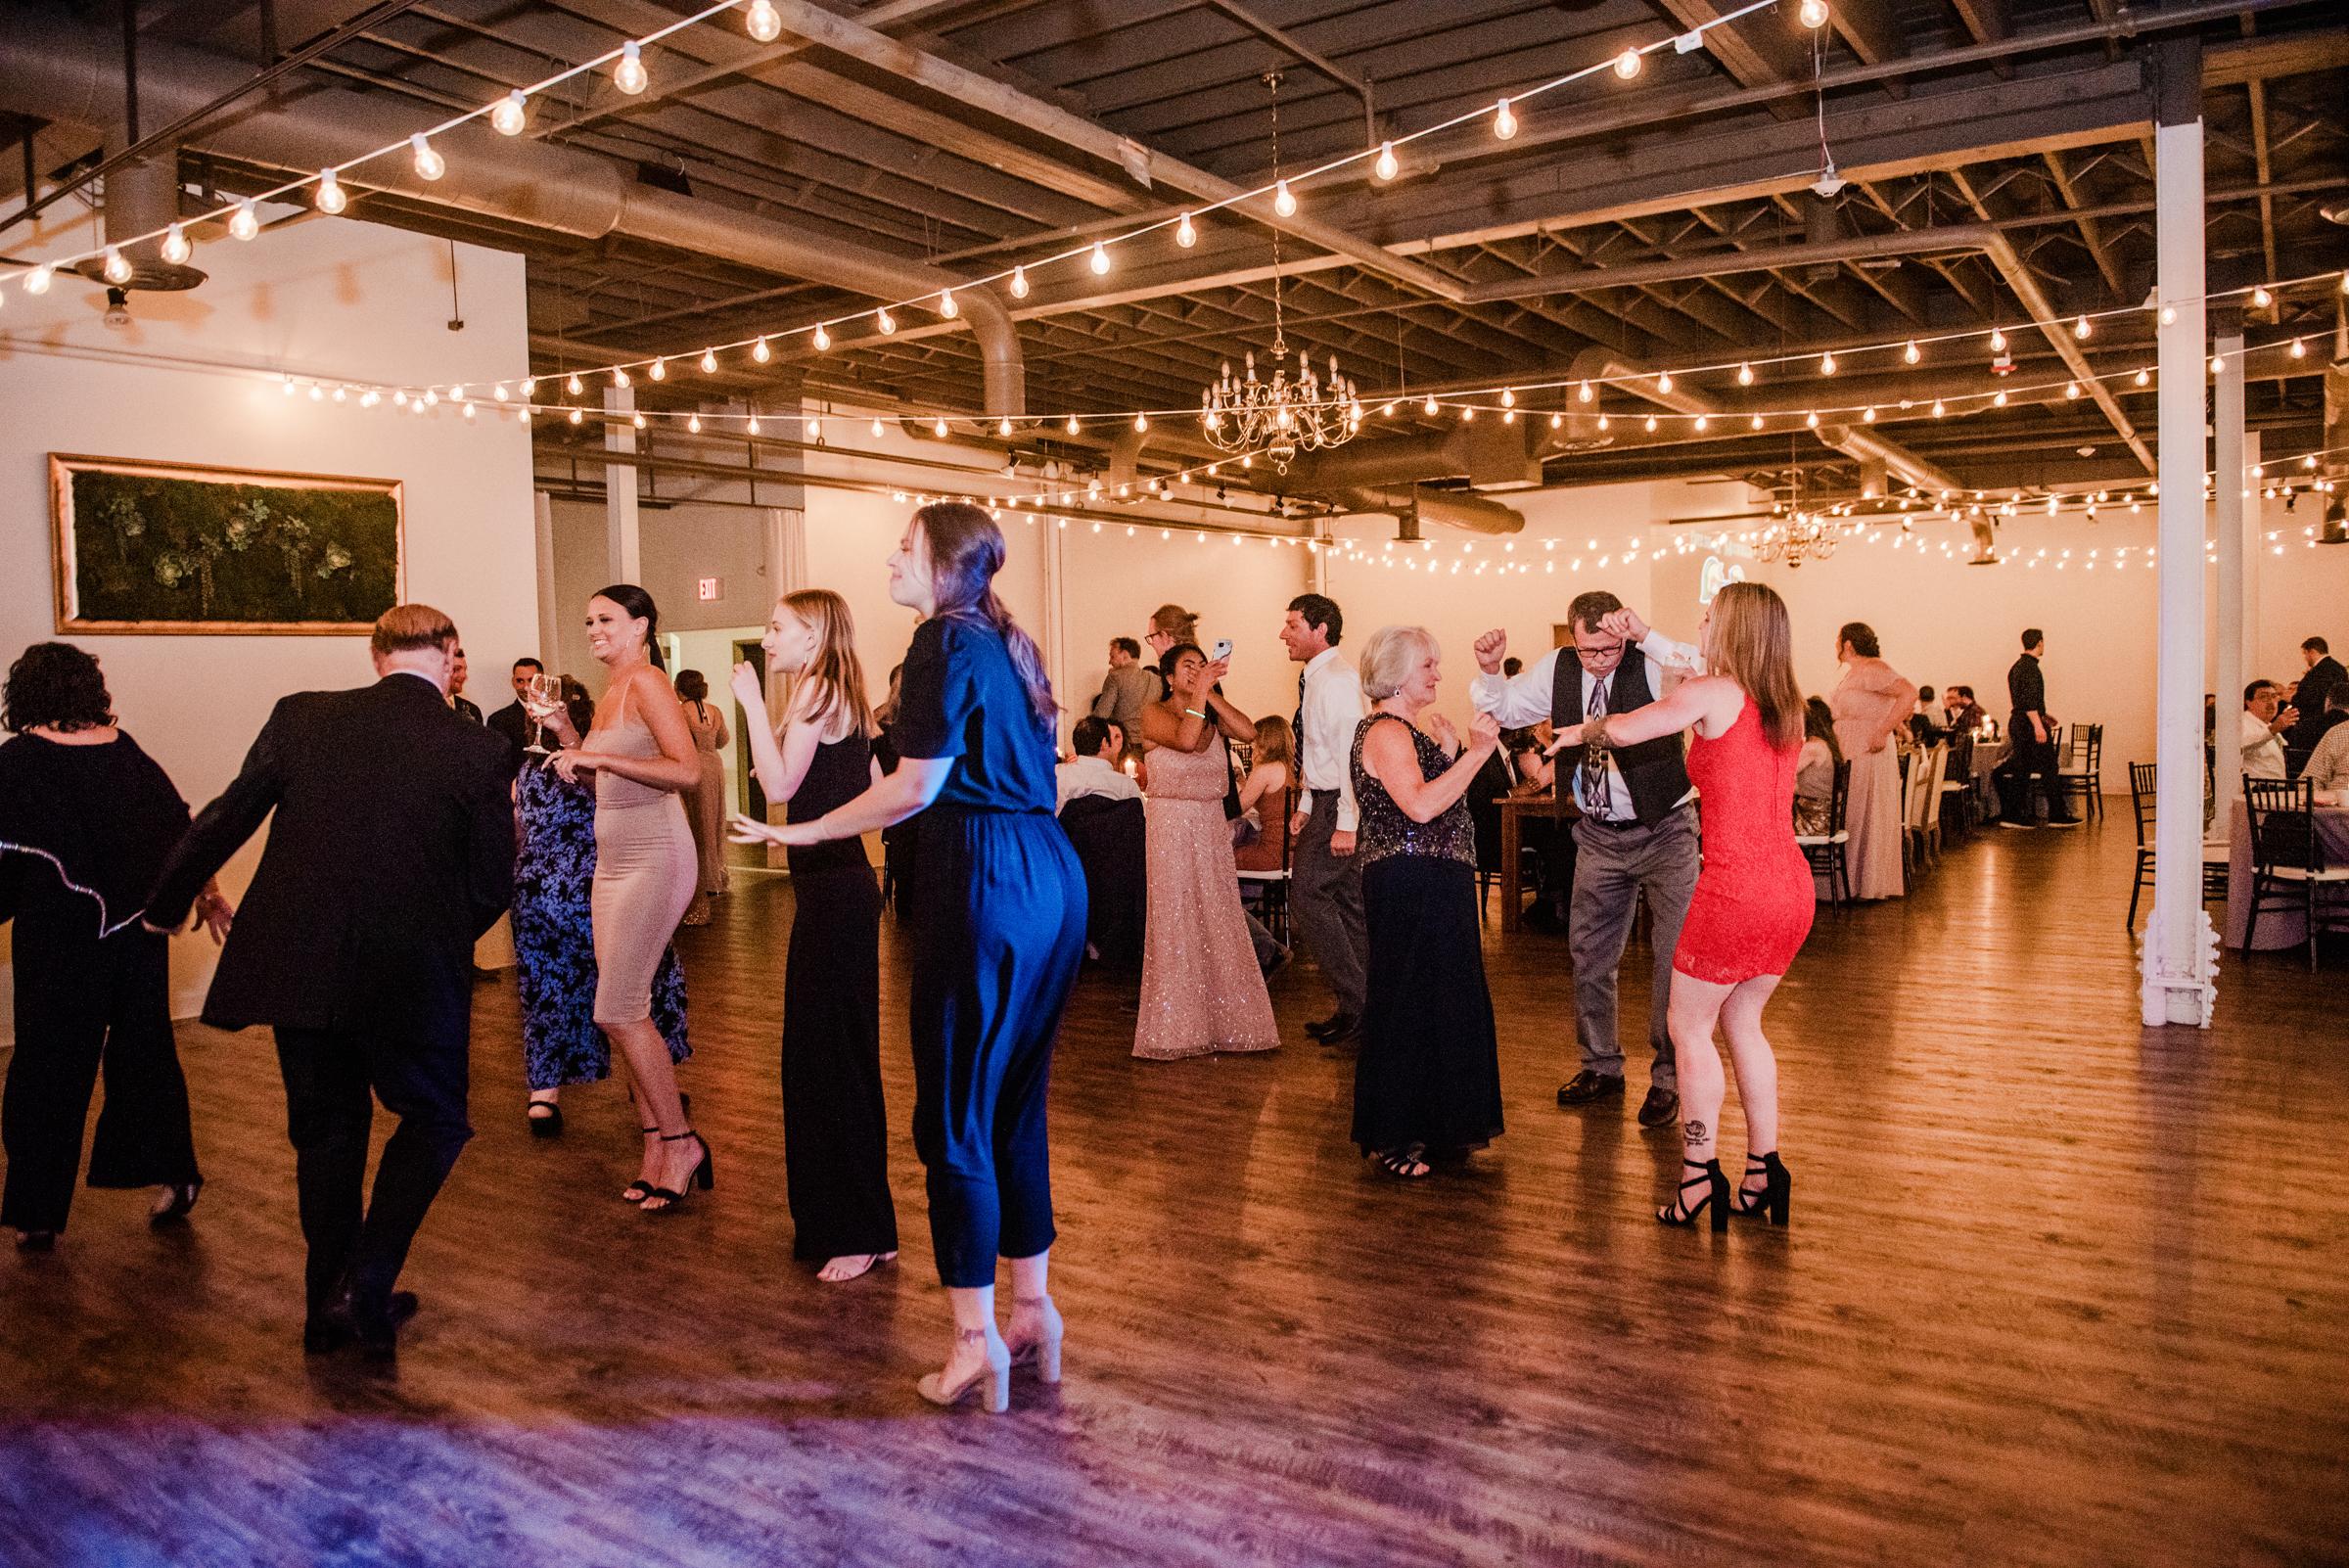 The_Arbor_LoftRochester_Wedding_JILL_STUDIO_Rochester_NY_Photographer_202706.jpg